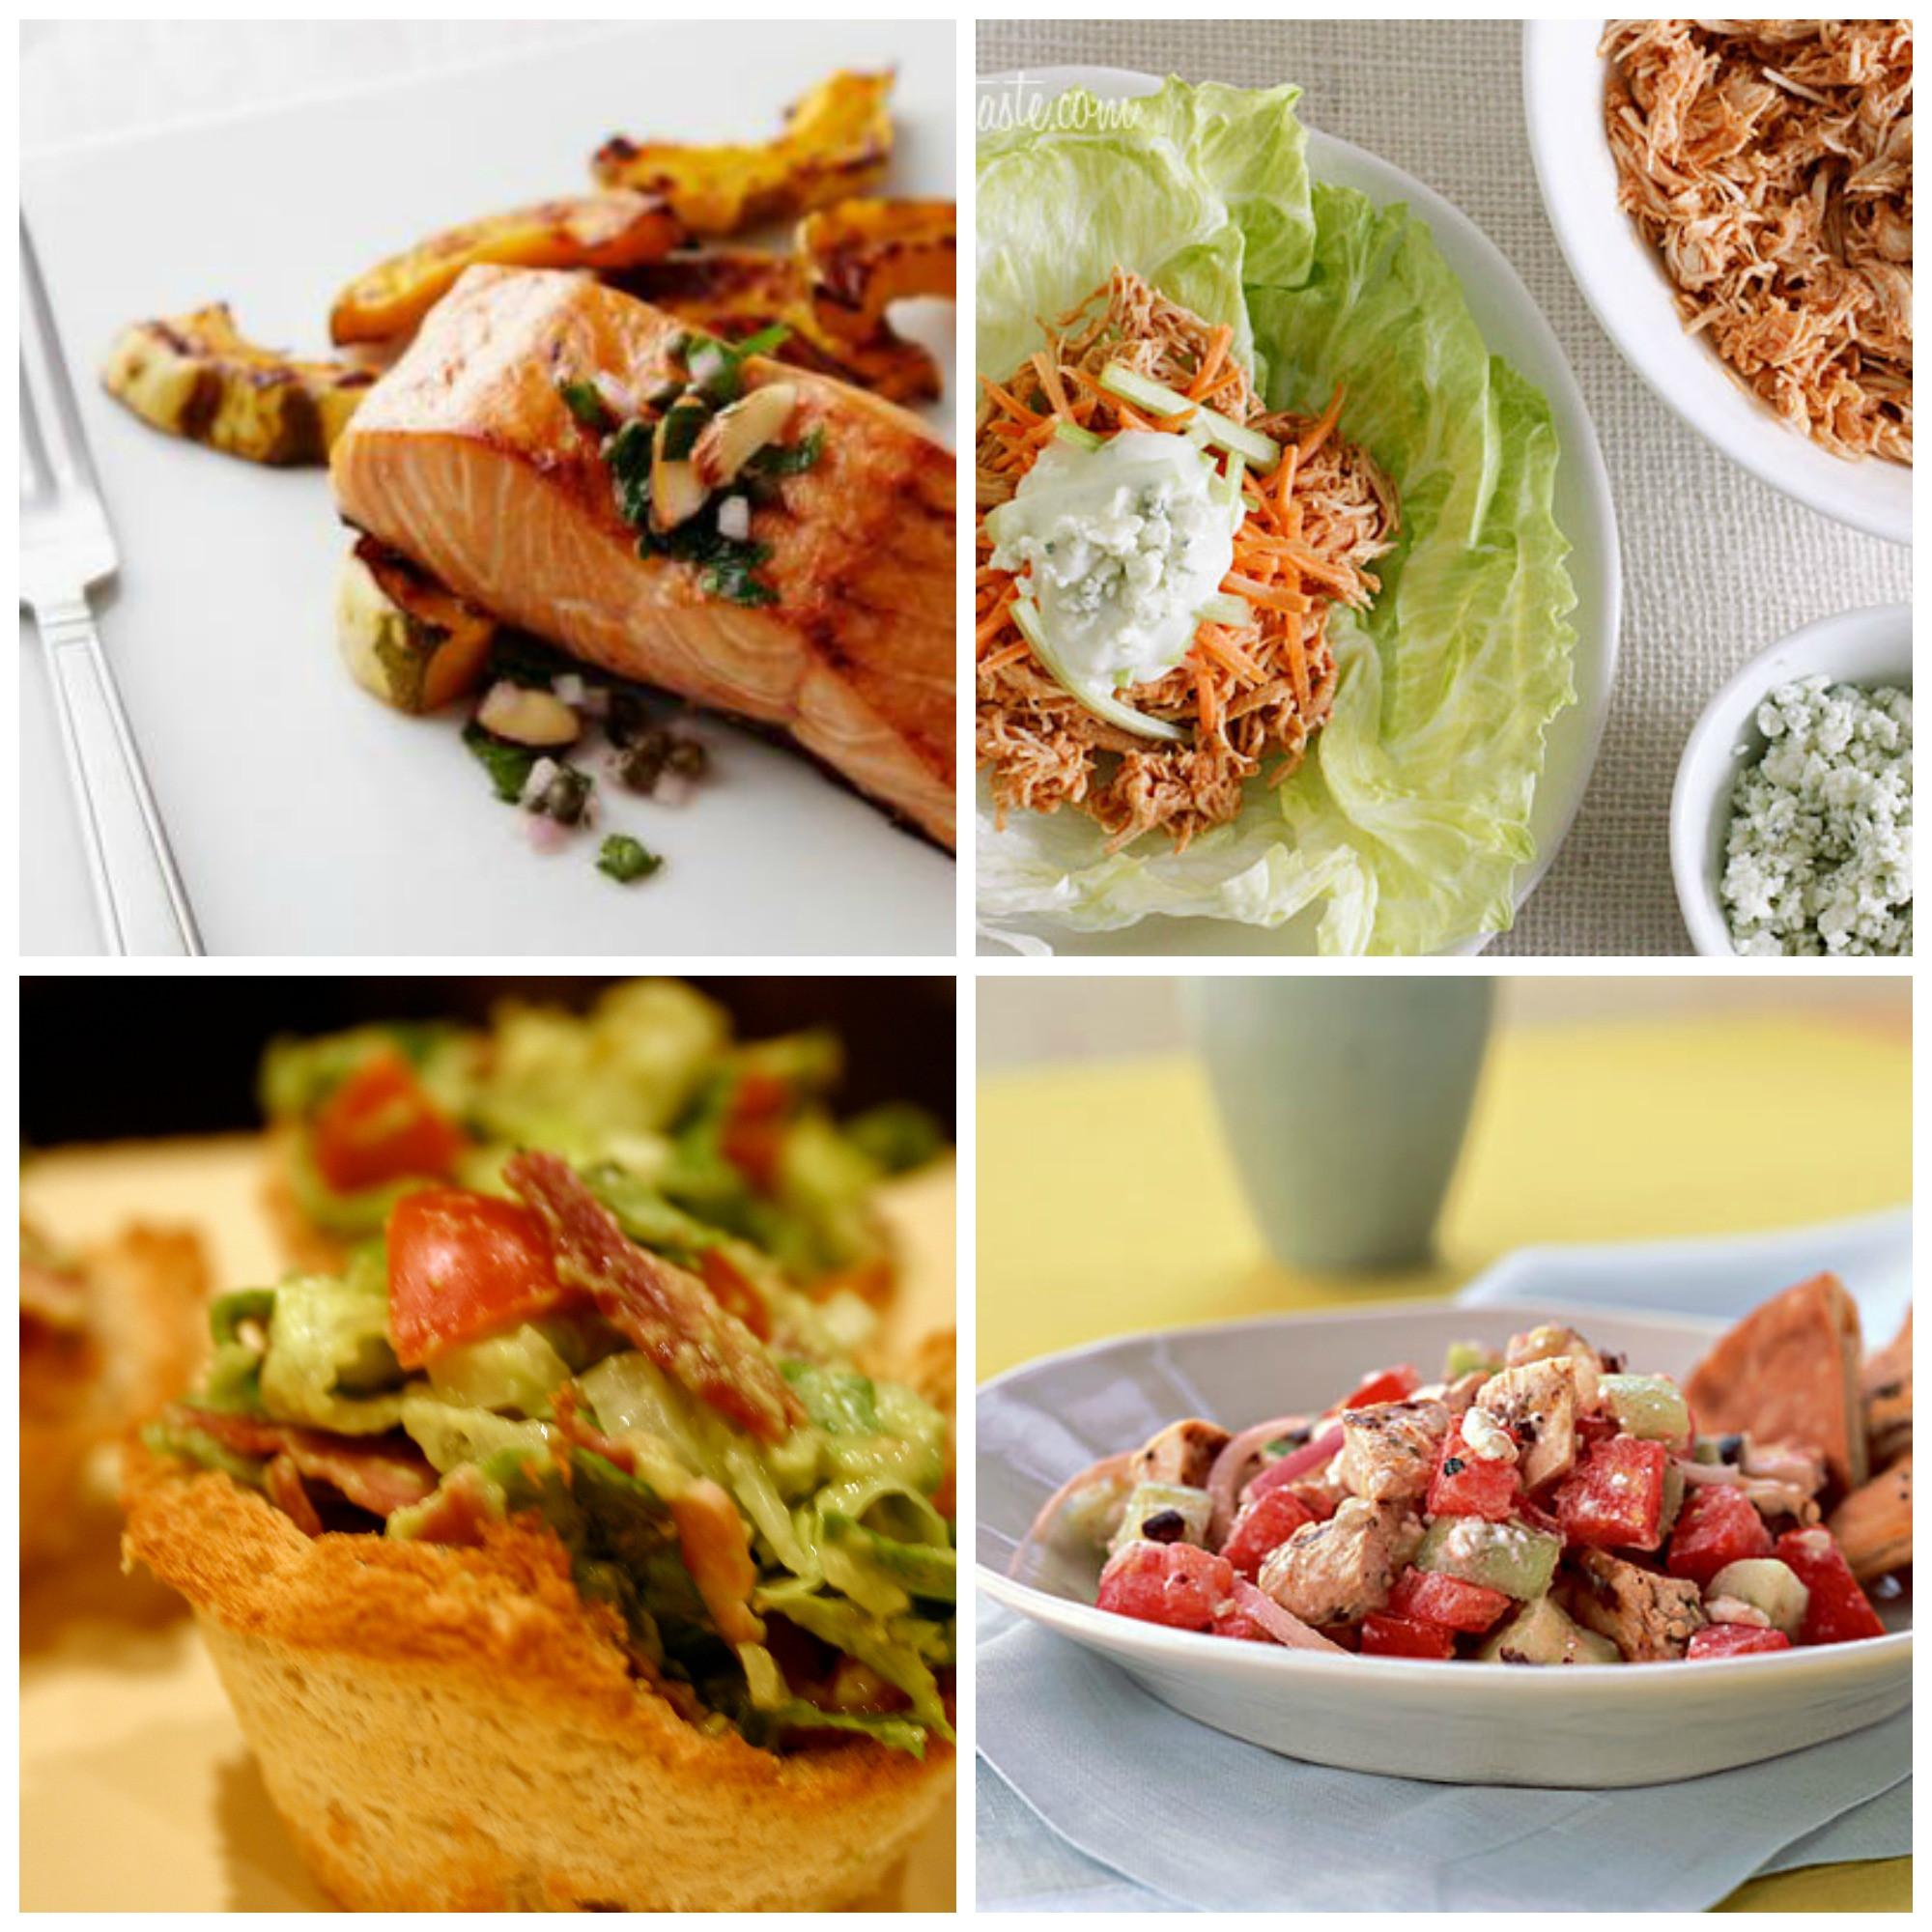 Light Healthy Dinner  Healthy and light weeknight dinner ideas